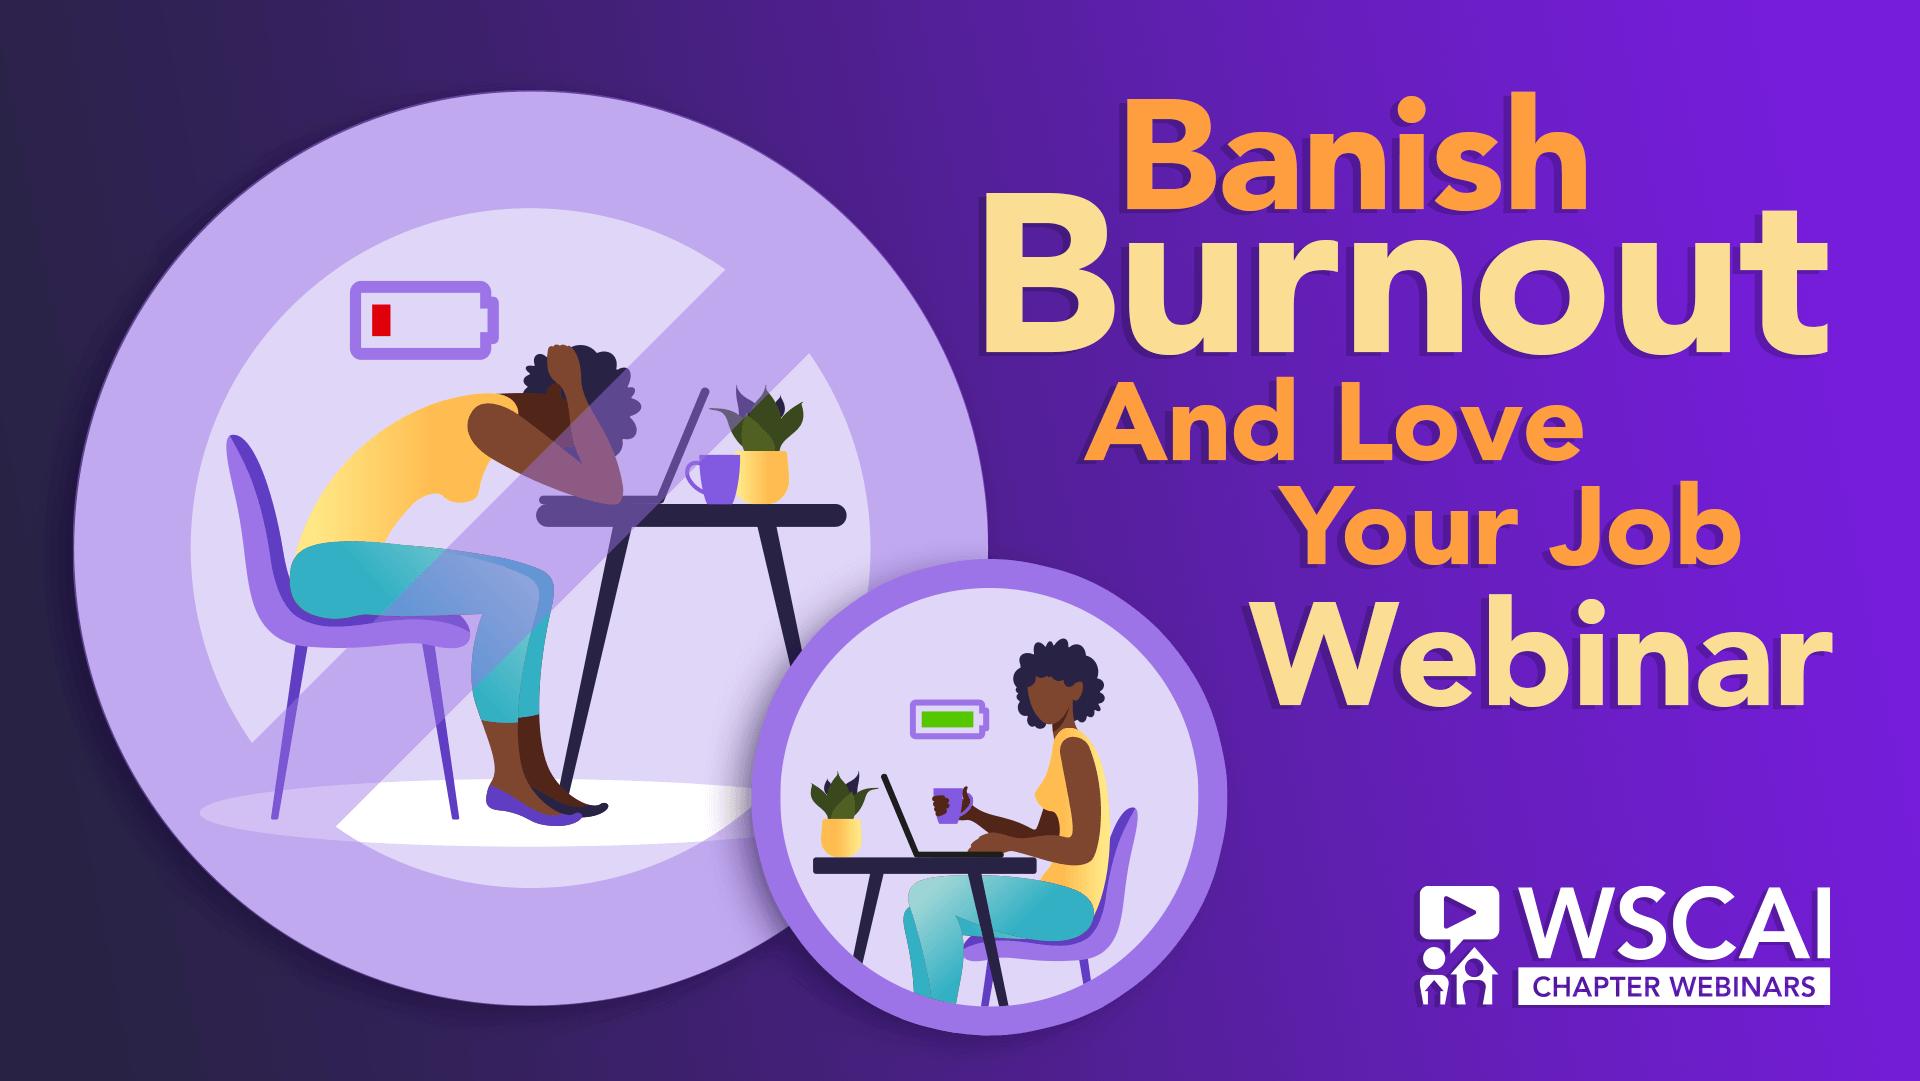 Banish Burnout & Love Your Job Webinar - WSCAI Chapter Webinars -Mobile Image